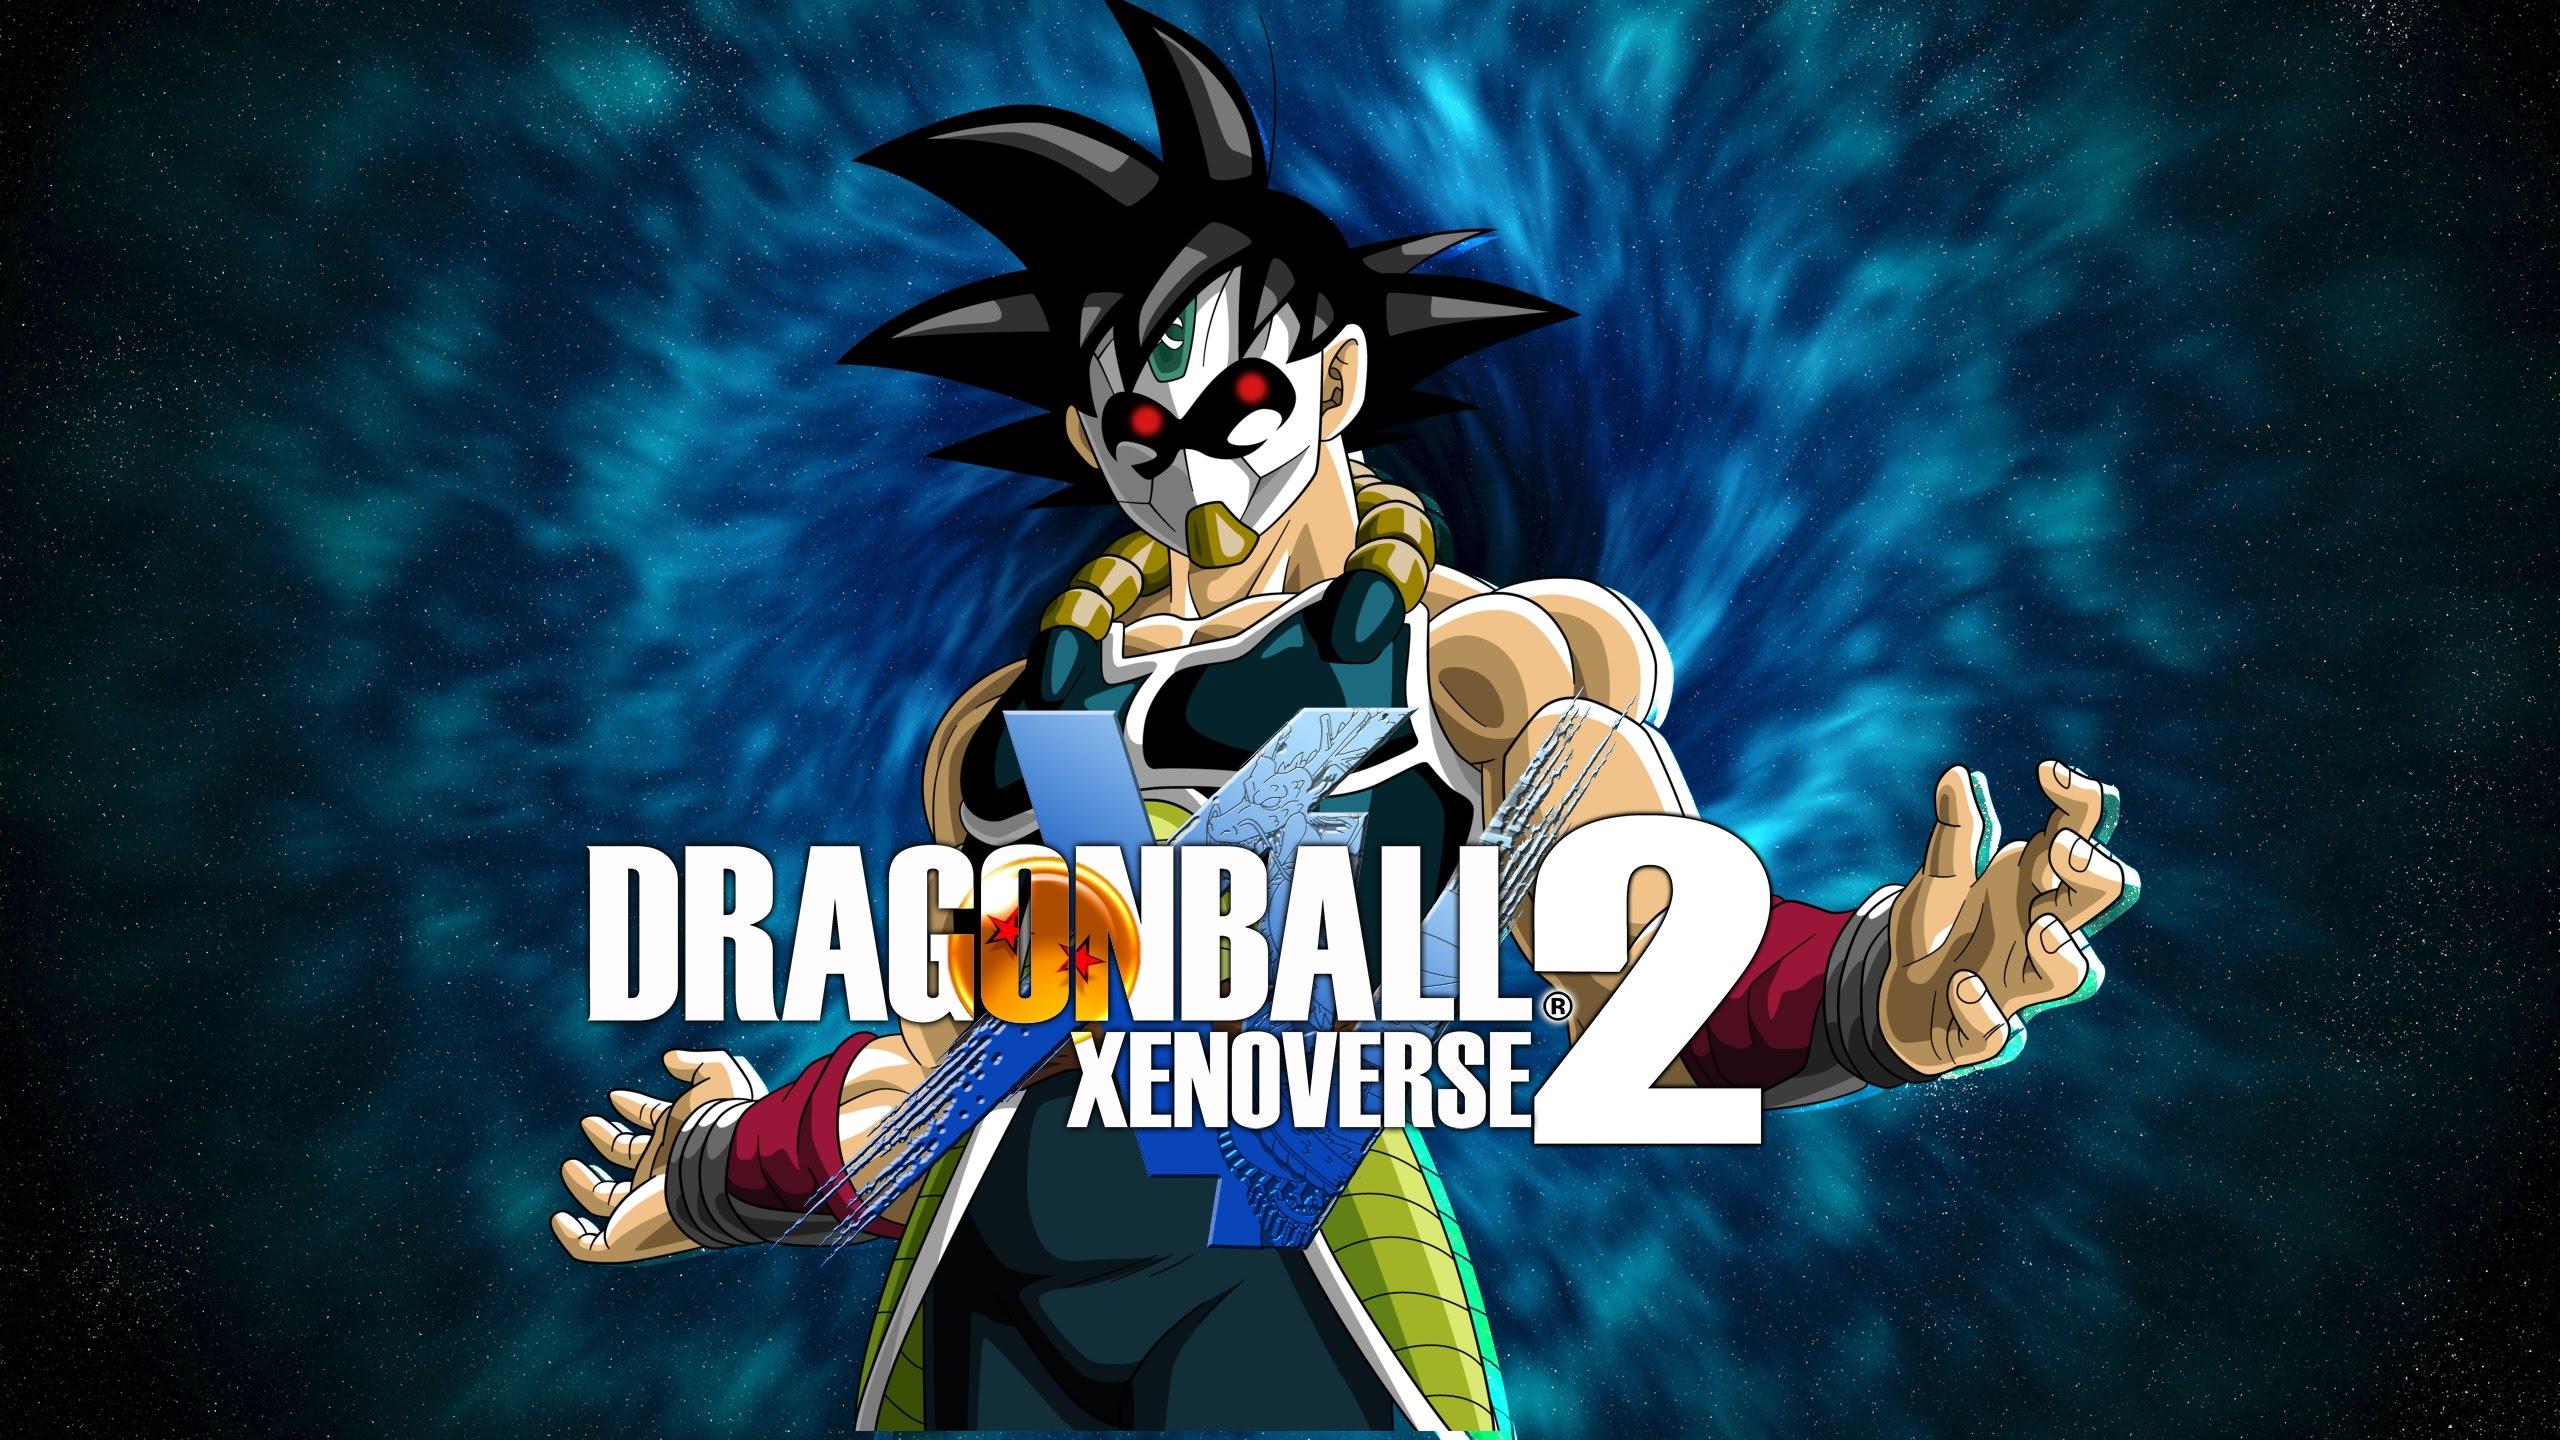 Dragon Ball Xenoverse 2 wallpaper 9 2560x1440